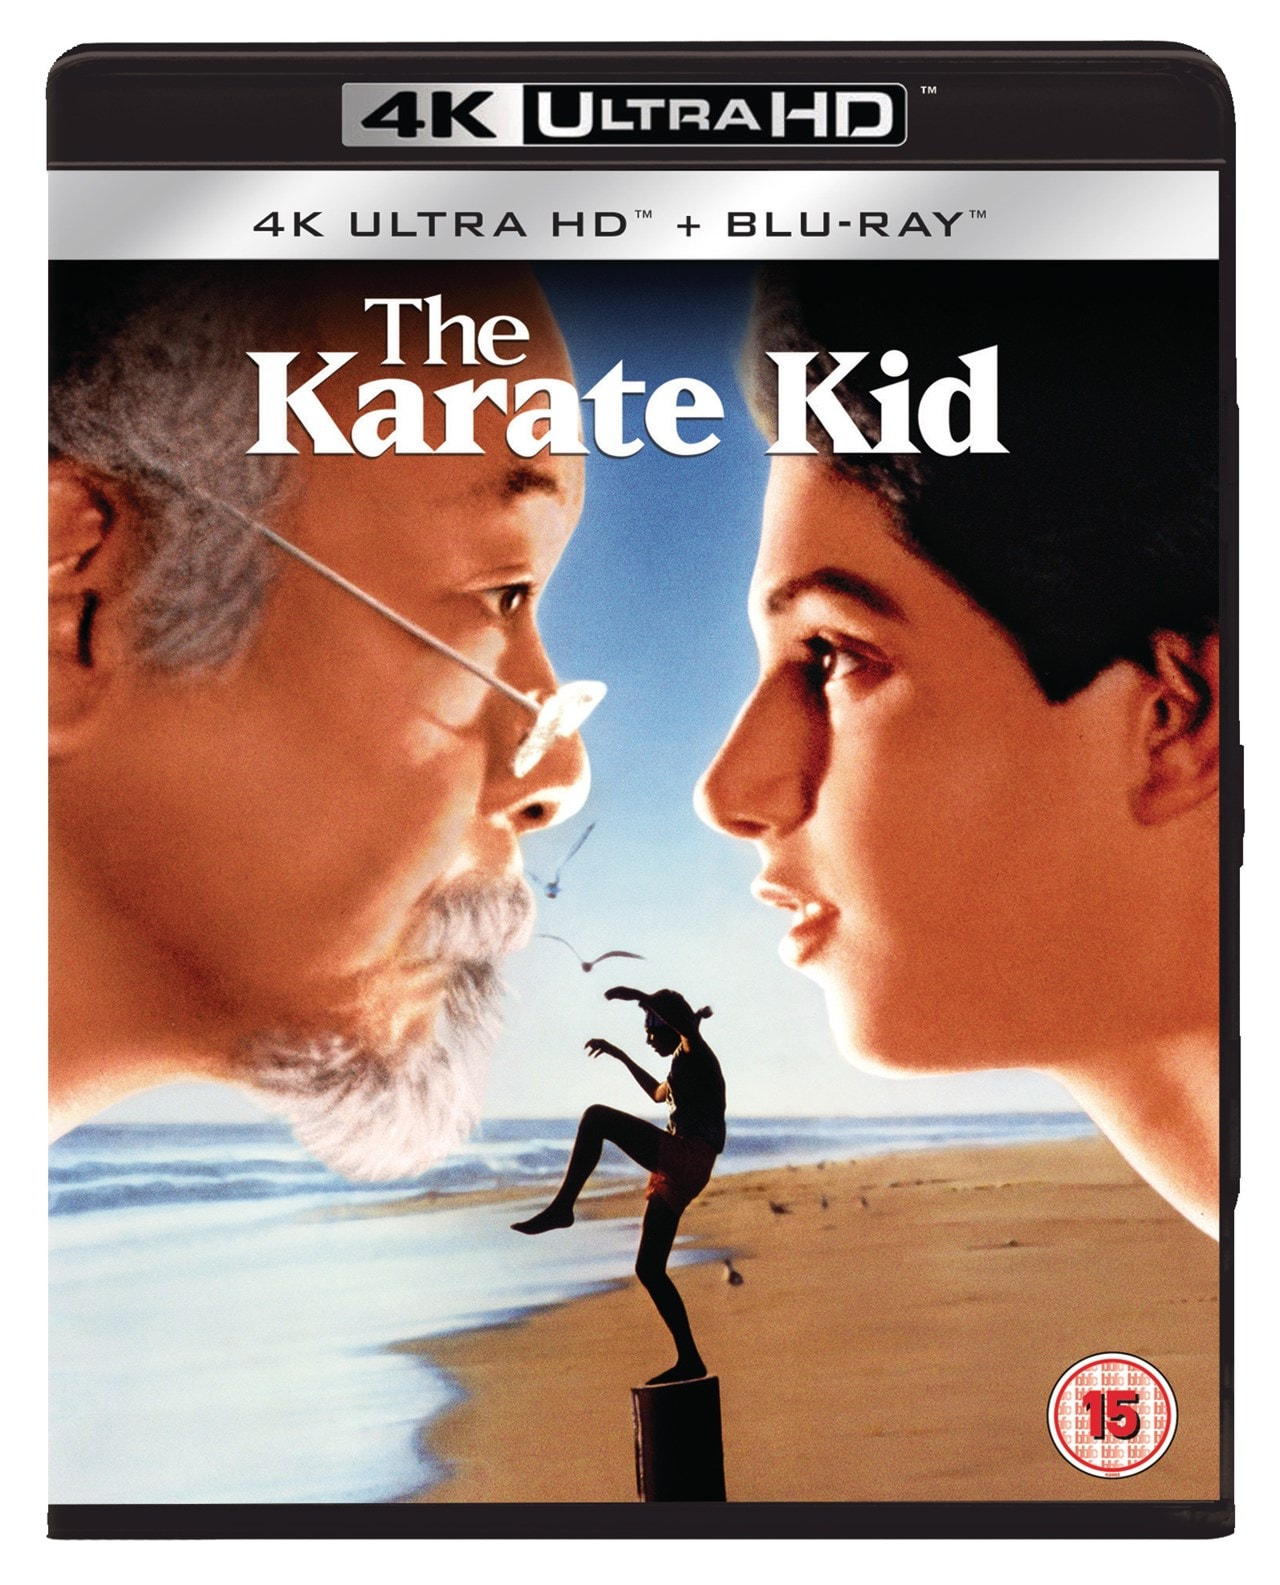 The Karate Kid - 1